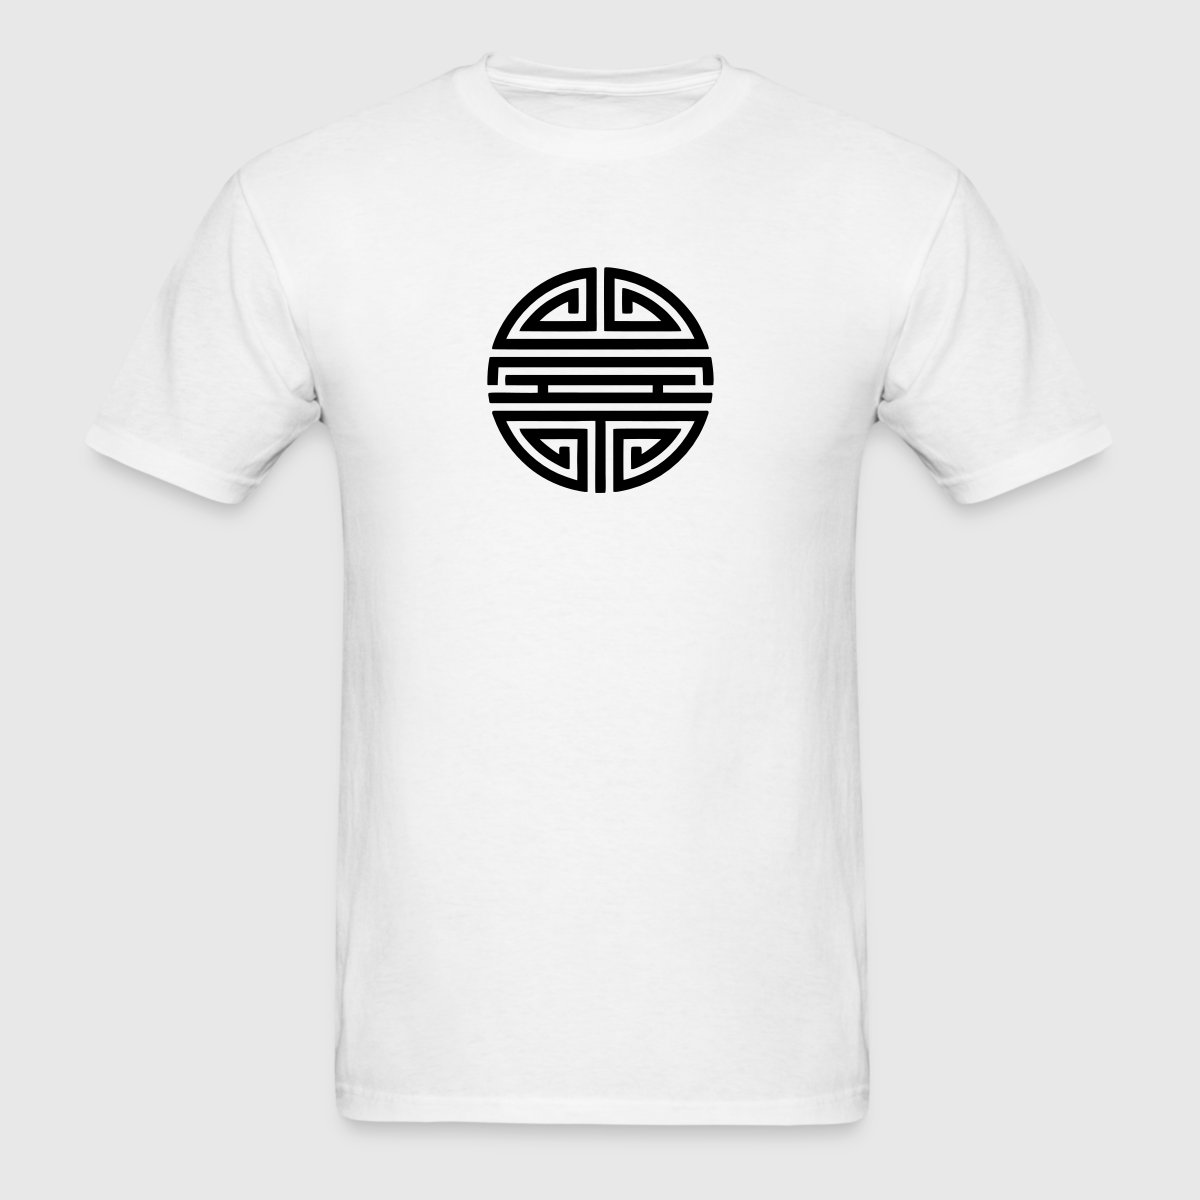 Shou chinesegood luck charm symbol long life t shirt shou chinesegood luck charm symbol long life t shirt spreadshirt biocorpaavc Gallery